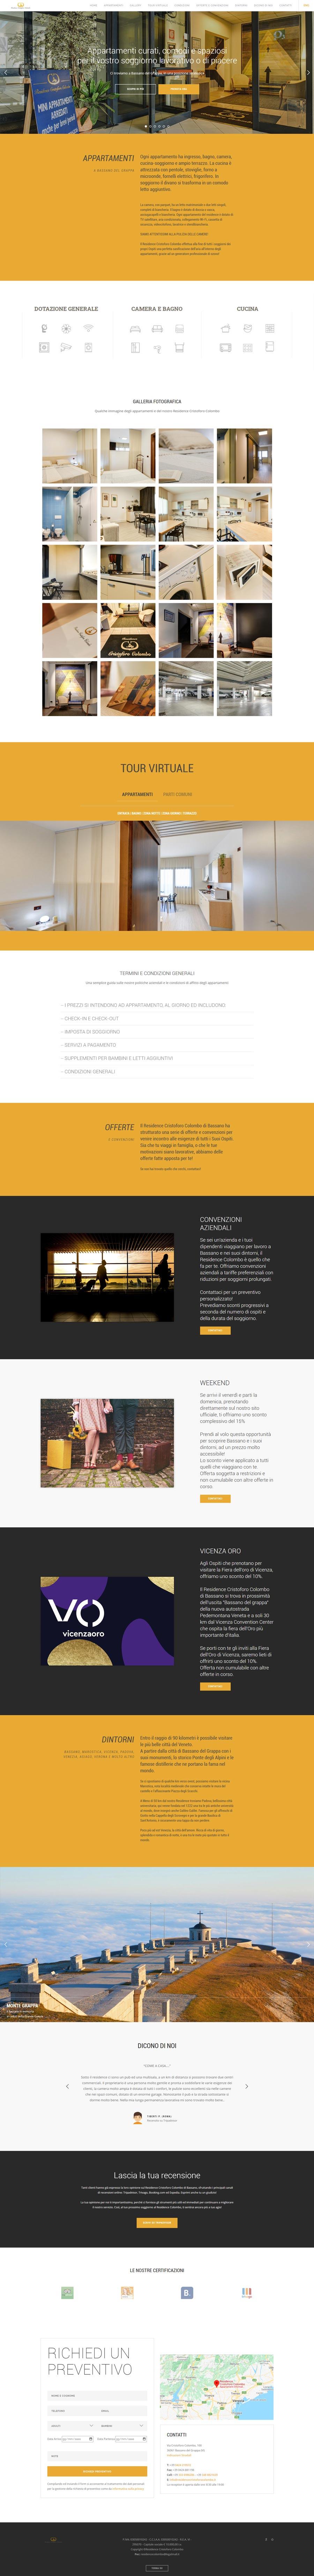 anteprima sito web residence cristoforo colombo bassano